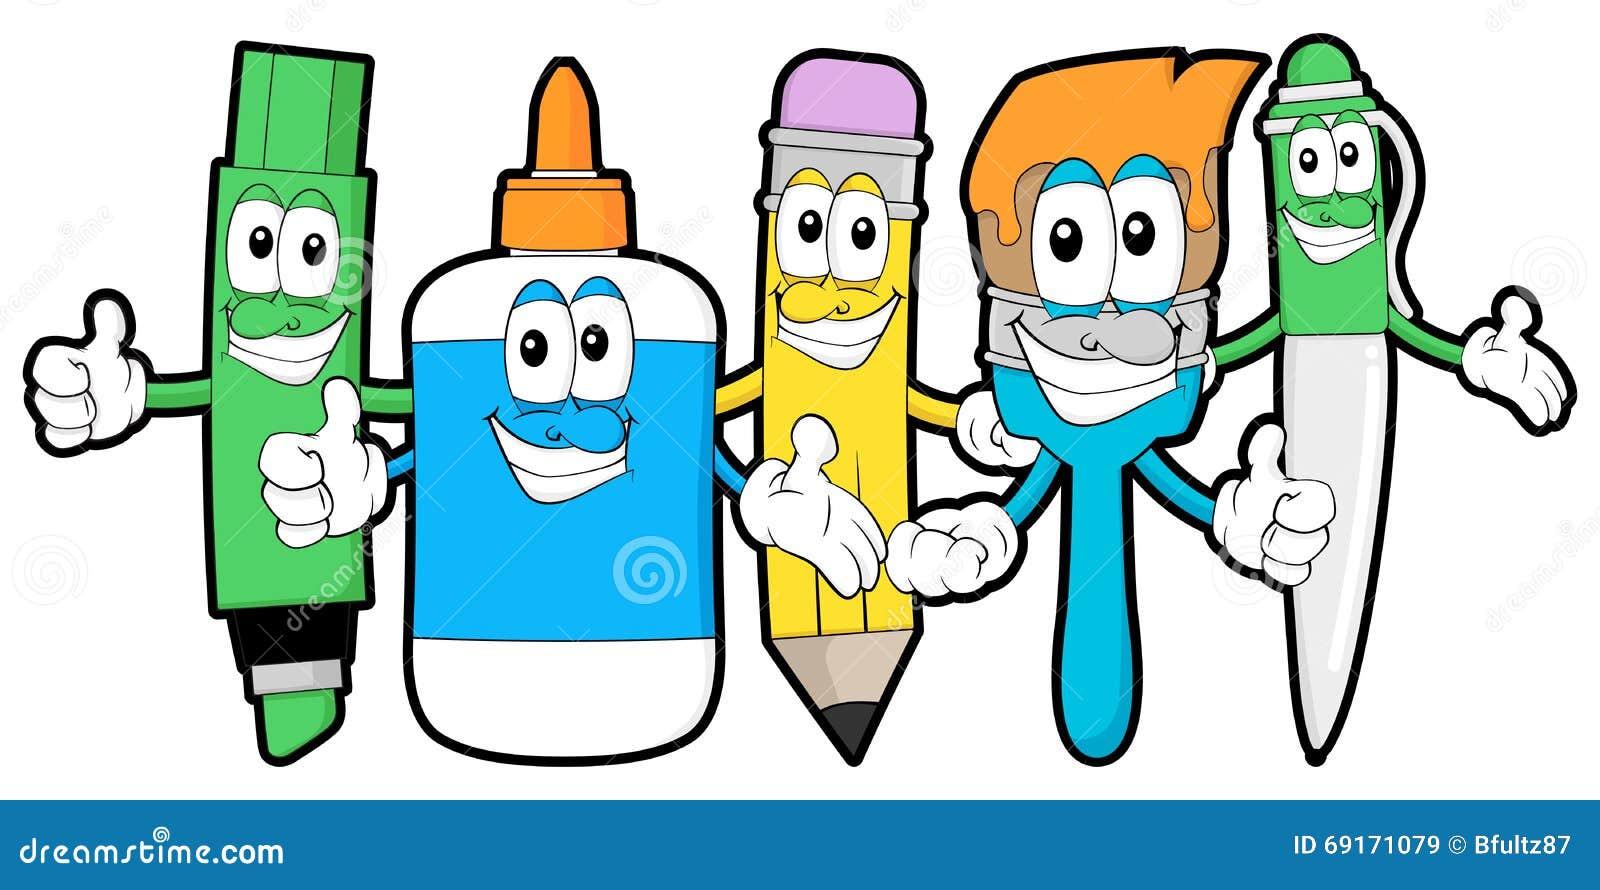 Cartoon Art Supplies Stock Vector - Image: 69171079